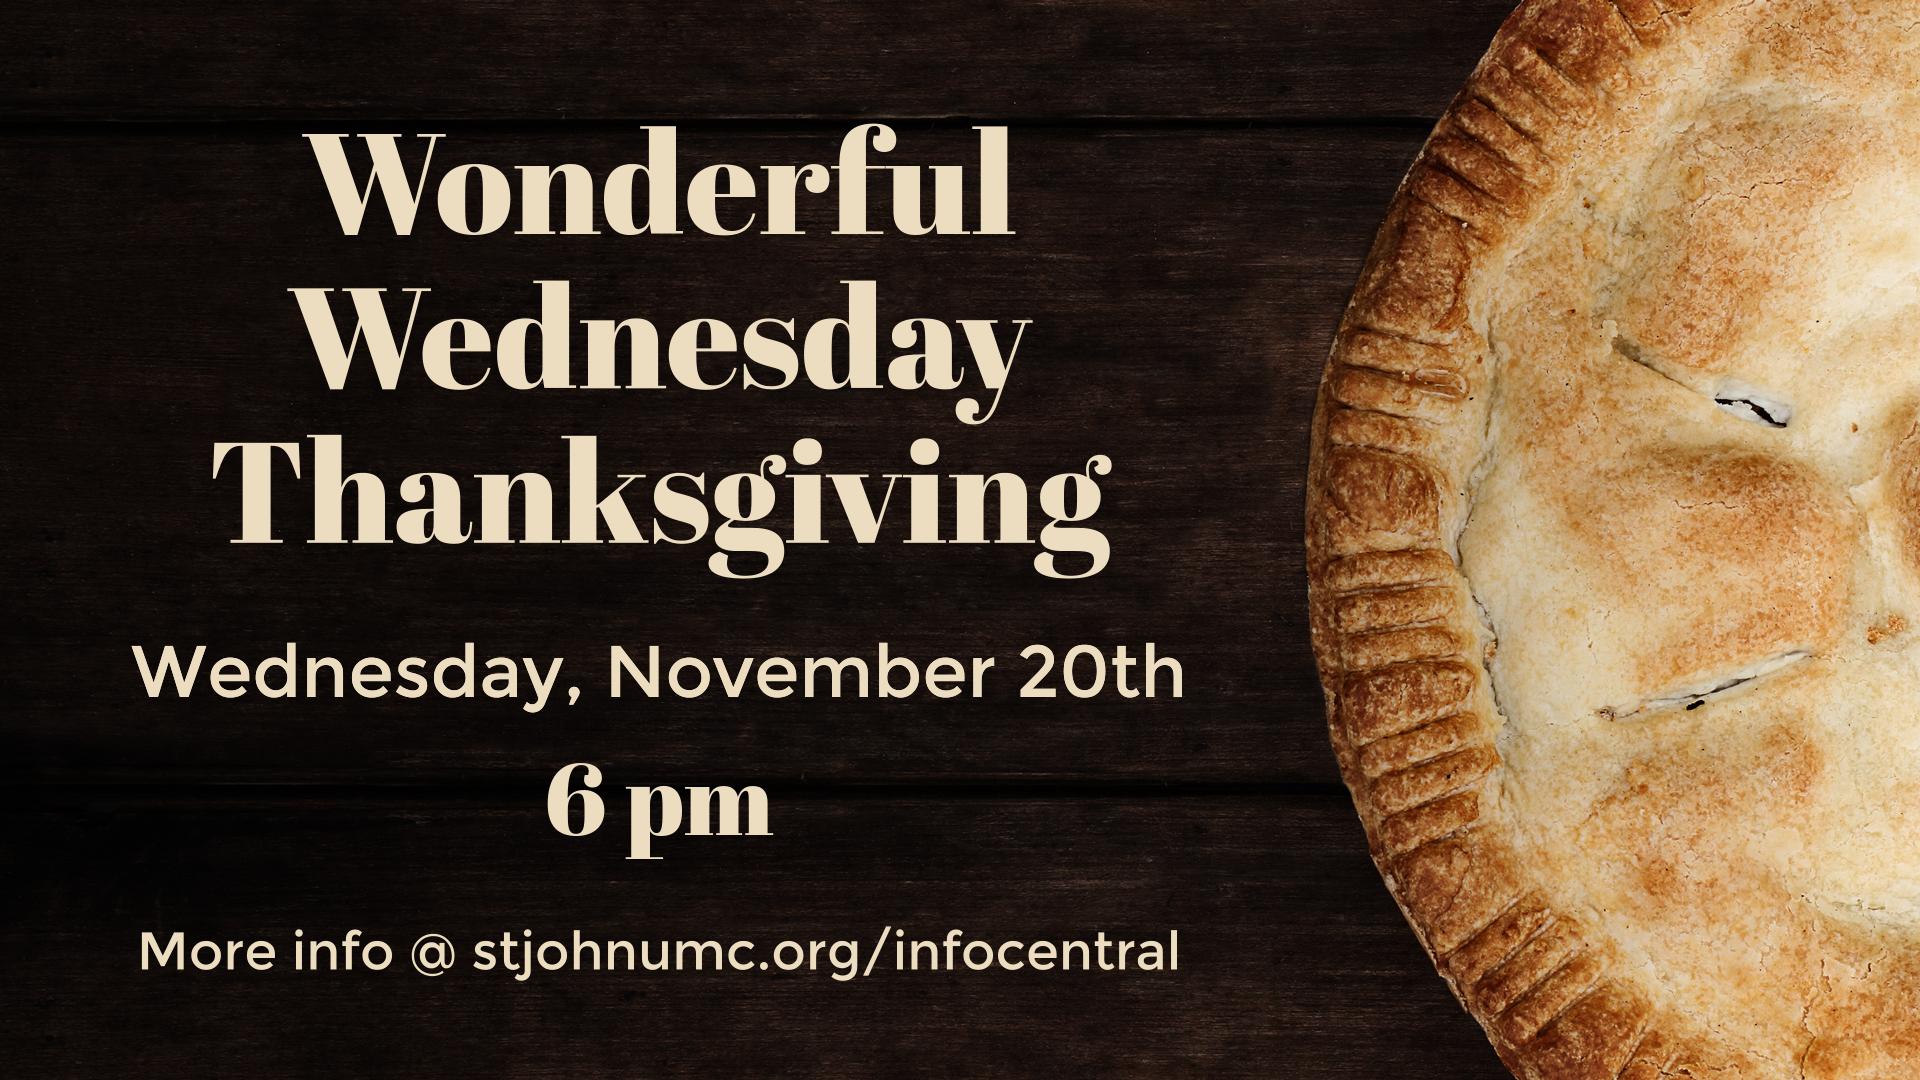 Wonderful Wednesday Thanksgiving